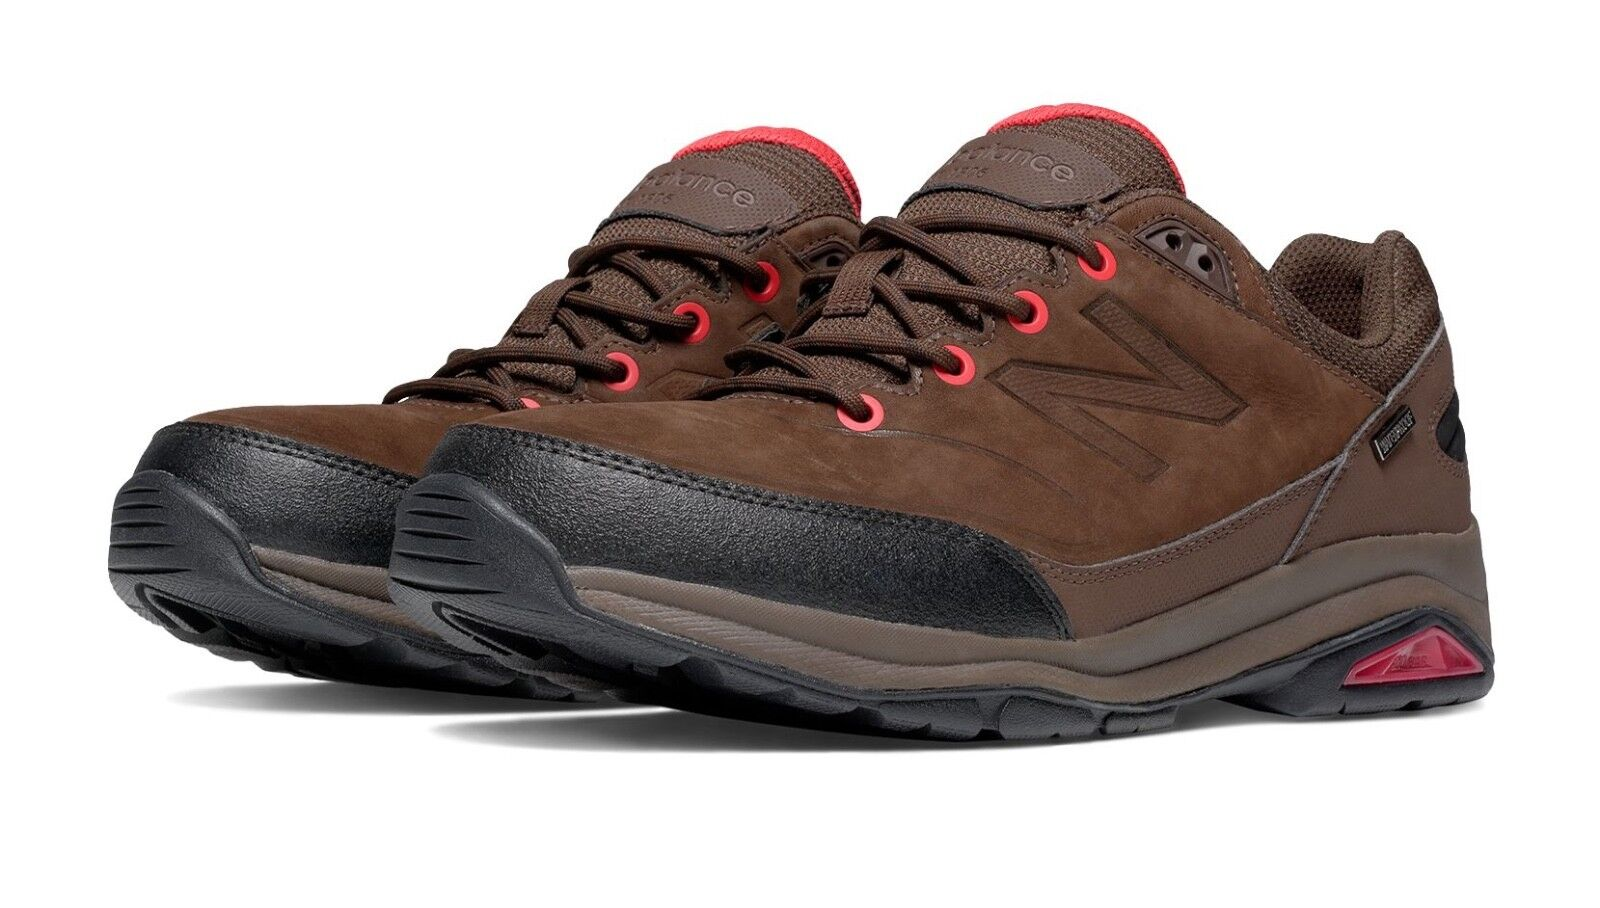 New balance shoes waterproof walking hiker outdoor mw1300br 1300 outdoor hiker hiking trail 0453b3